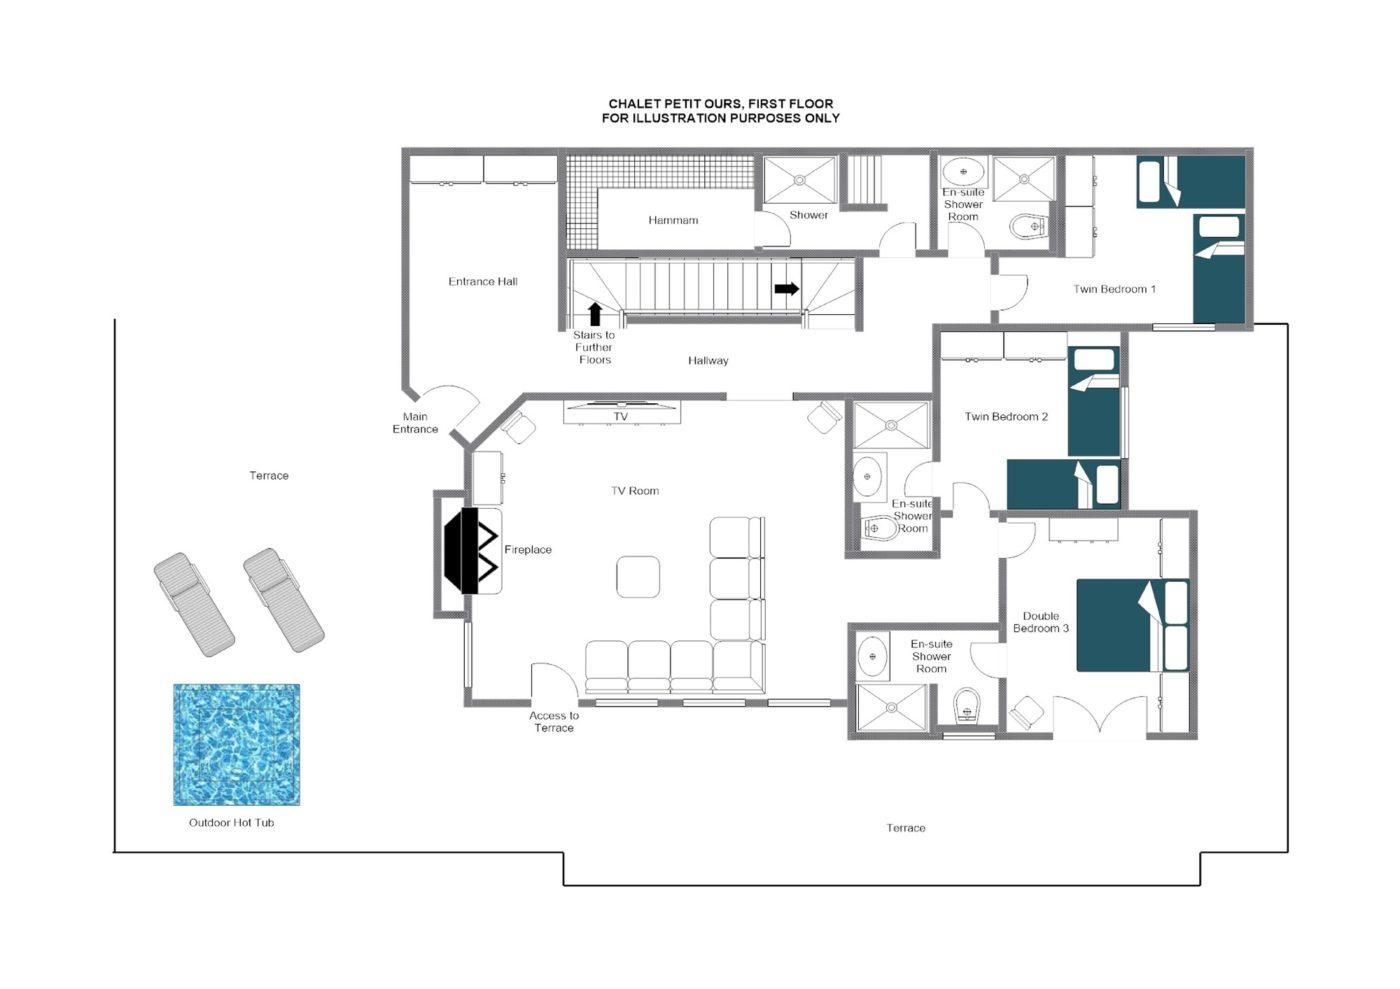 Chalet Petit Ours Verbier Floor Plan 3